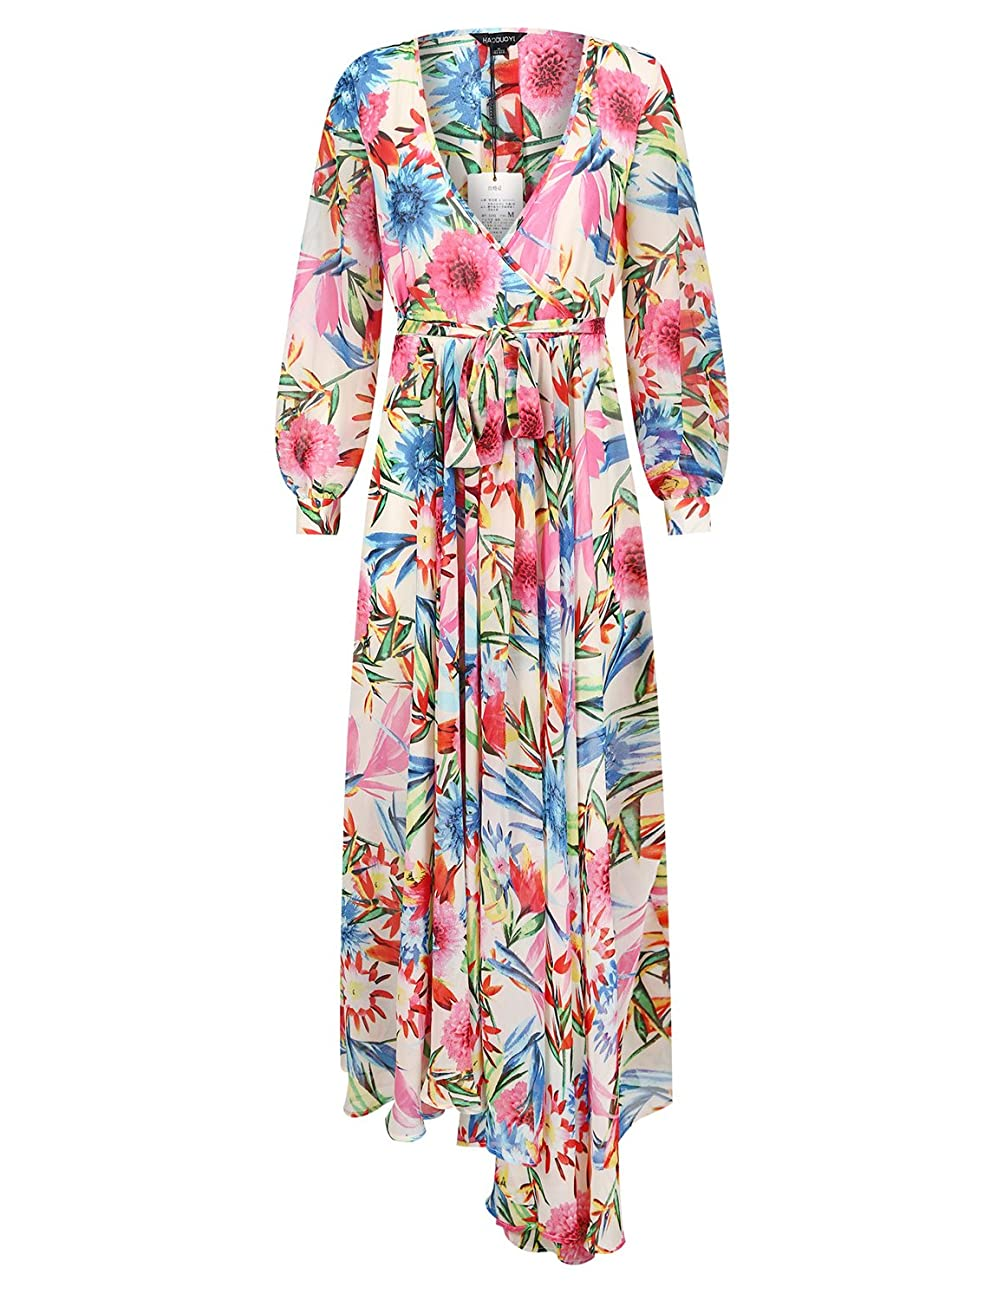 Haoyihui Vintage Style Chiffon V Neck Puff Pleated Wrap Long Maxi Full-Skirted Dress 1